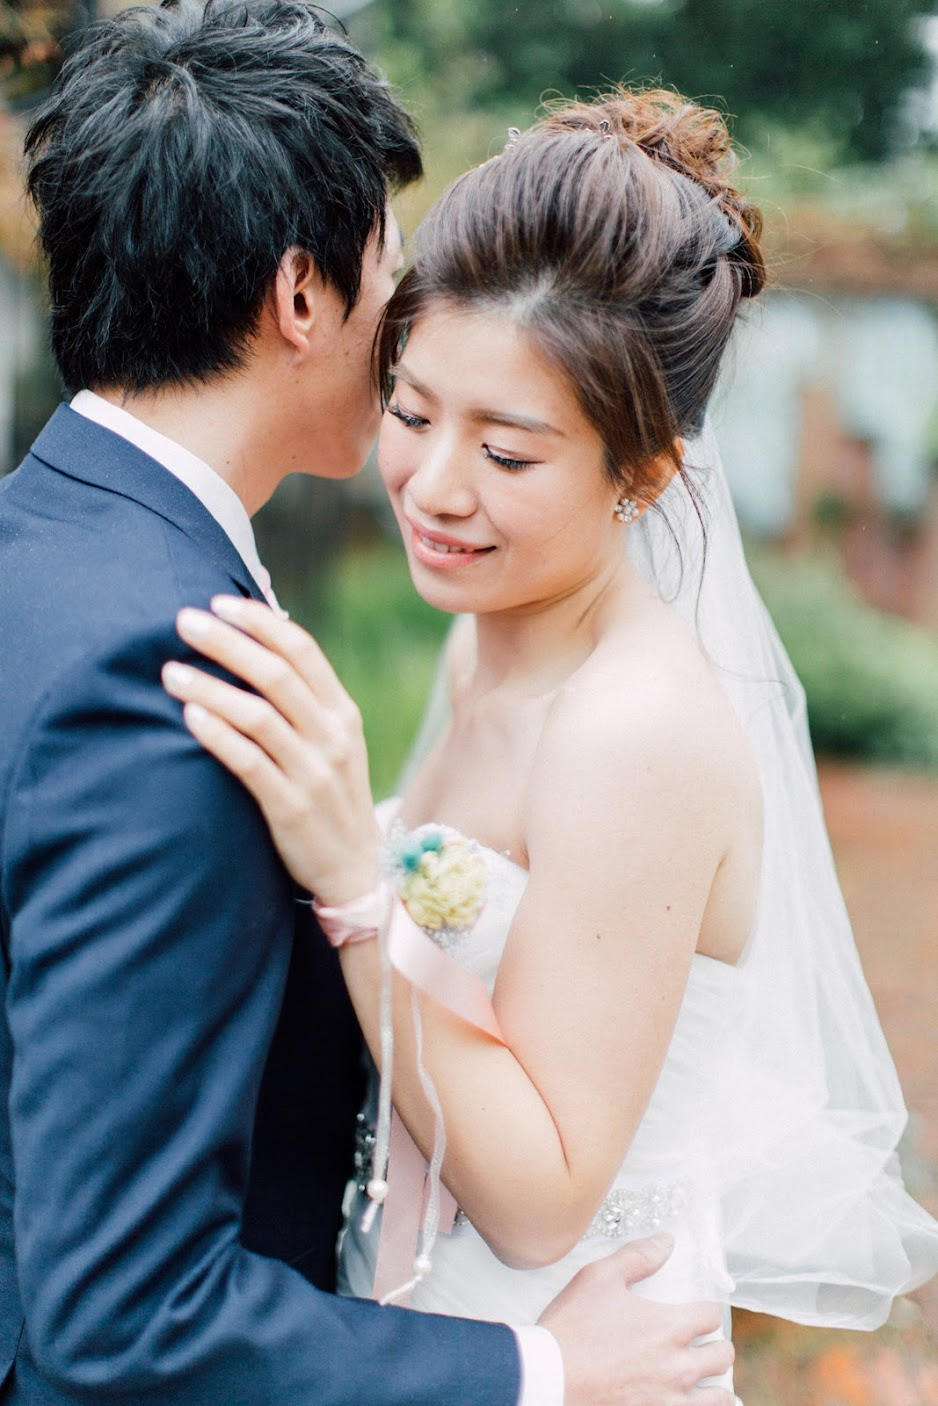 Amazing grace攝影美學,陽明山美軍俱樂部婚禮,婚禮紀錄攝影